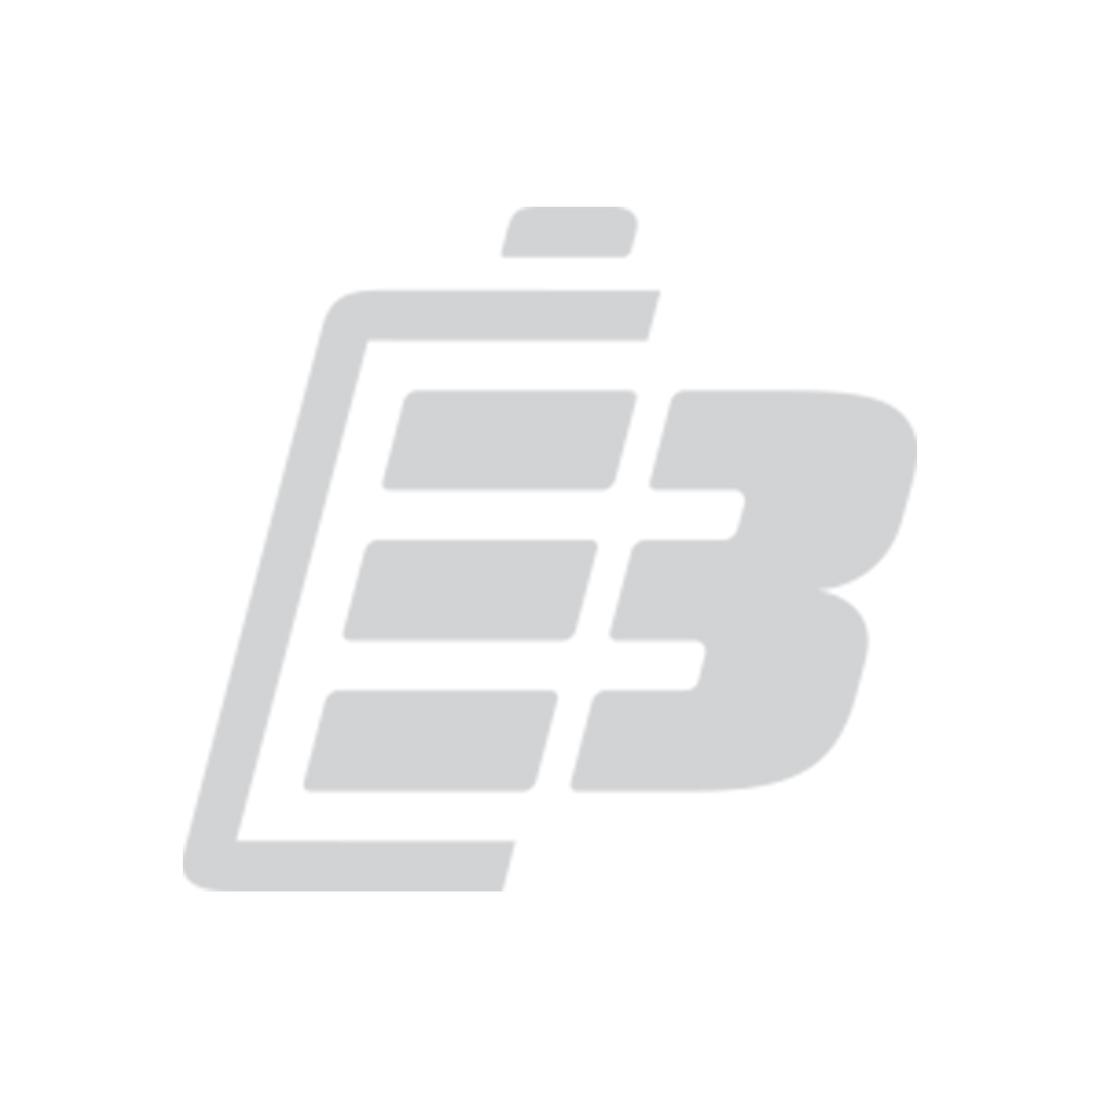 Camcorder battery Panasonic CRG-D54_1